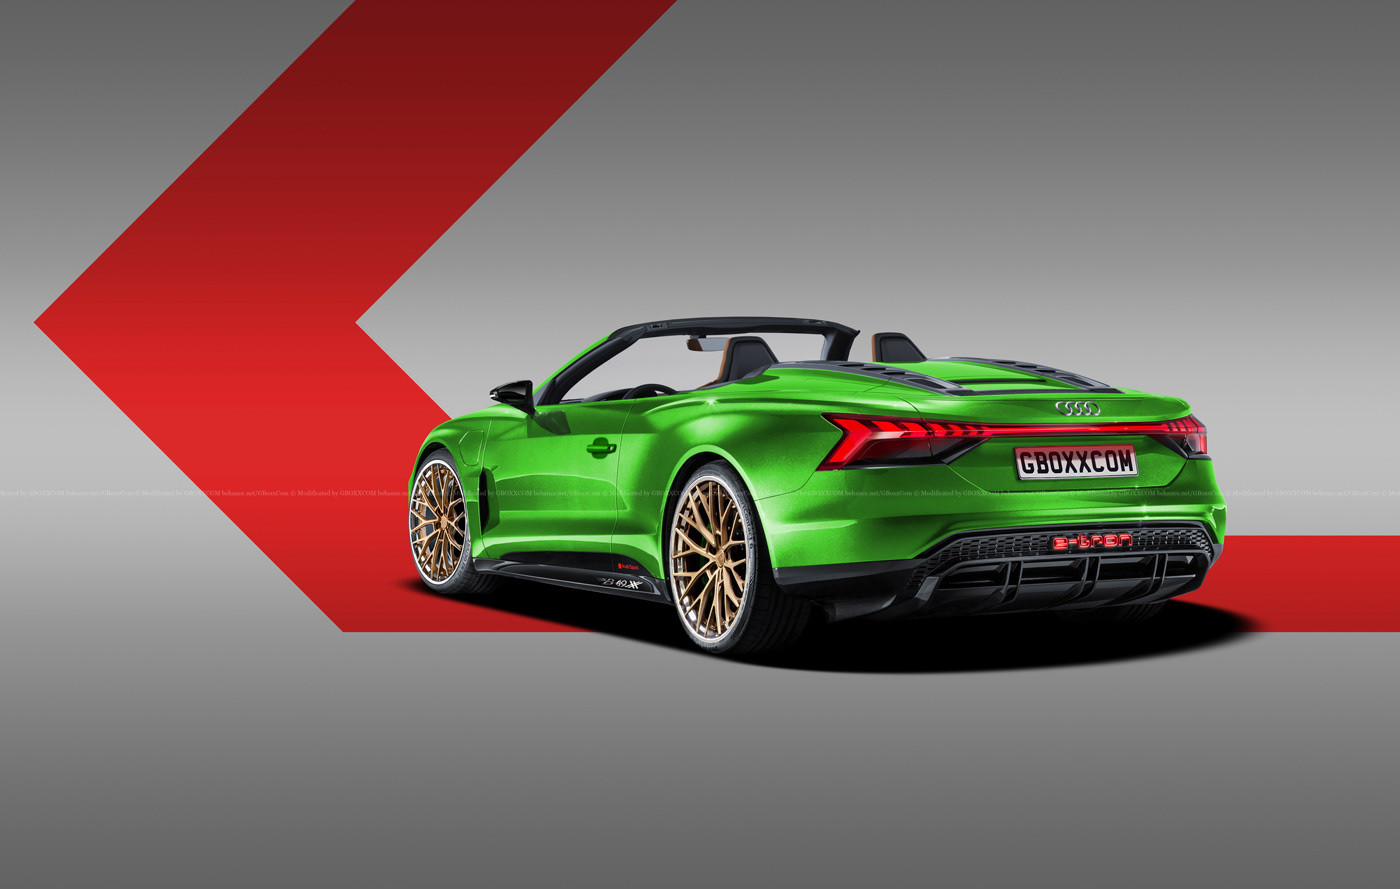 Audi E-Tron GT Spyder, E-Tron GT Wagon, E-Tron GT Coupe Renderings (6)